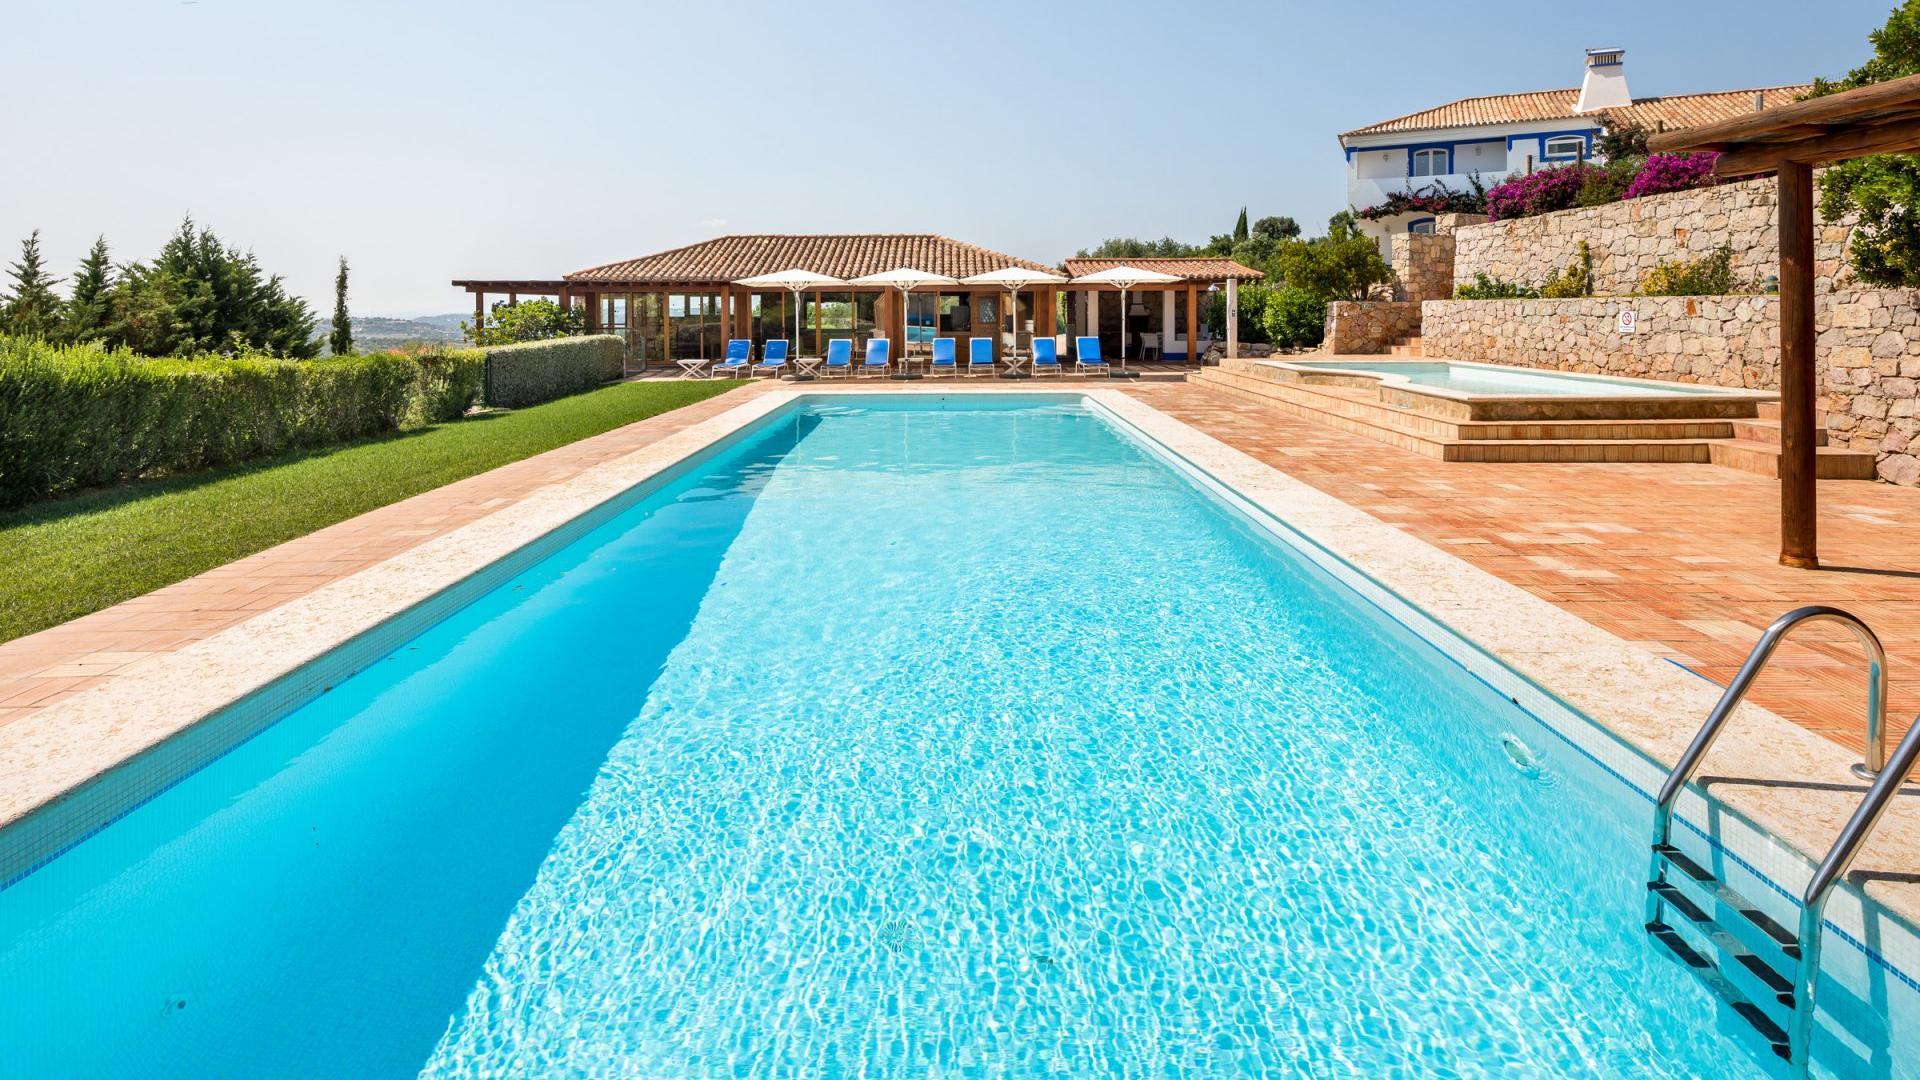 Villa Verde - Boliqueime, Algarve - _55A7784-HDR.jpg